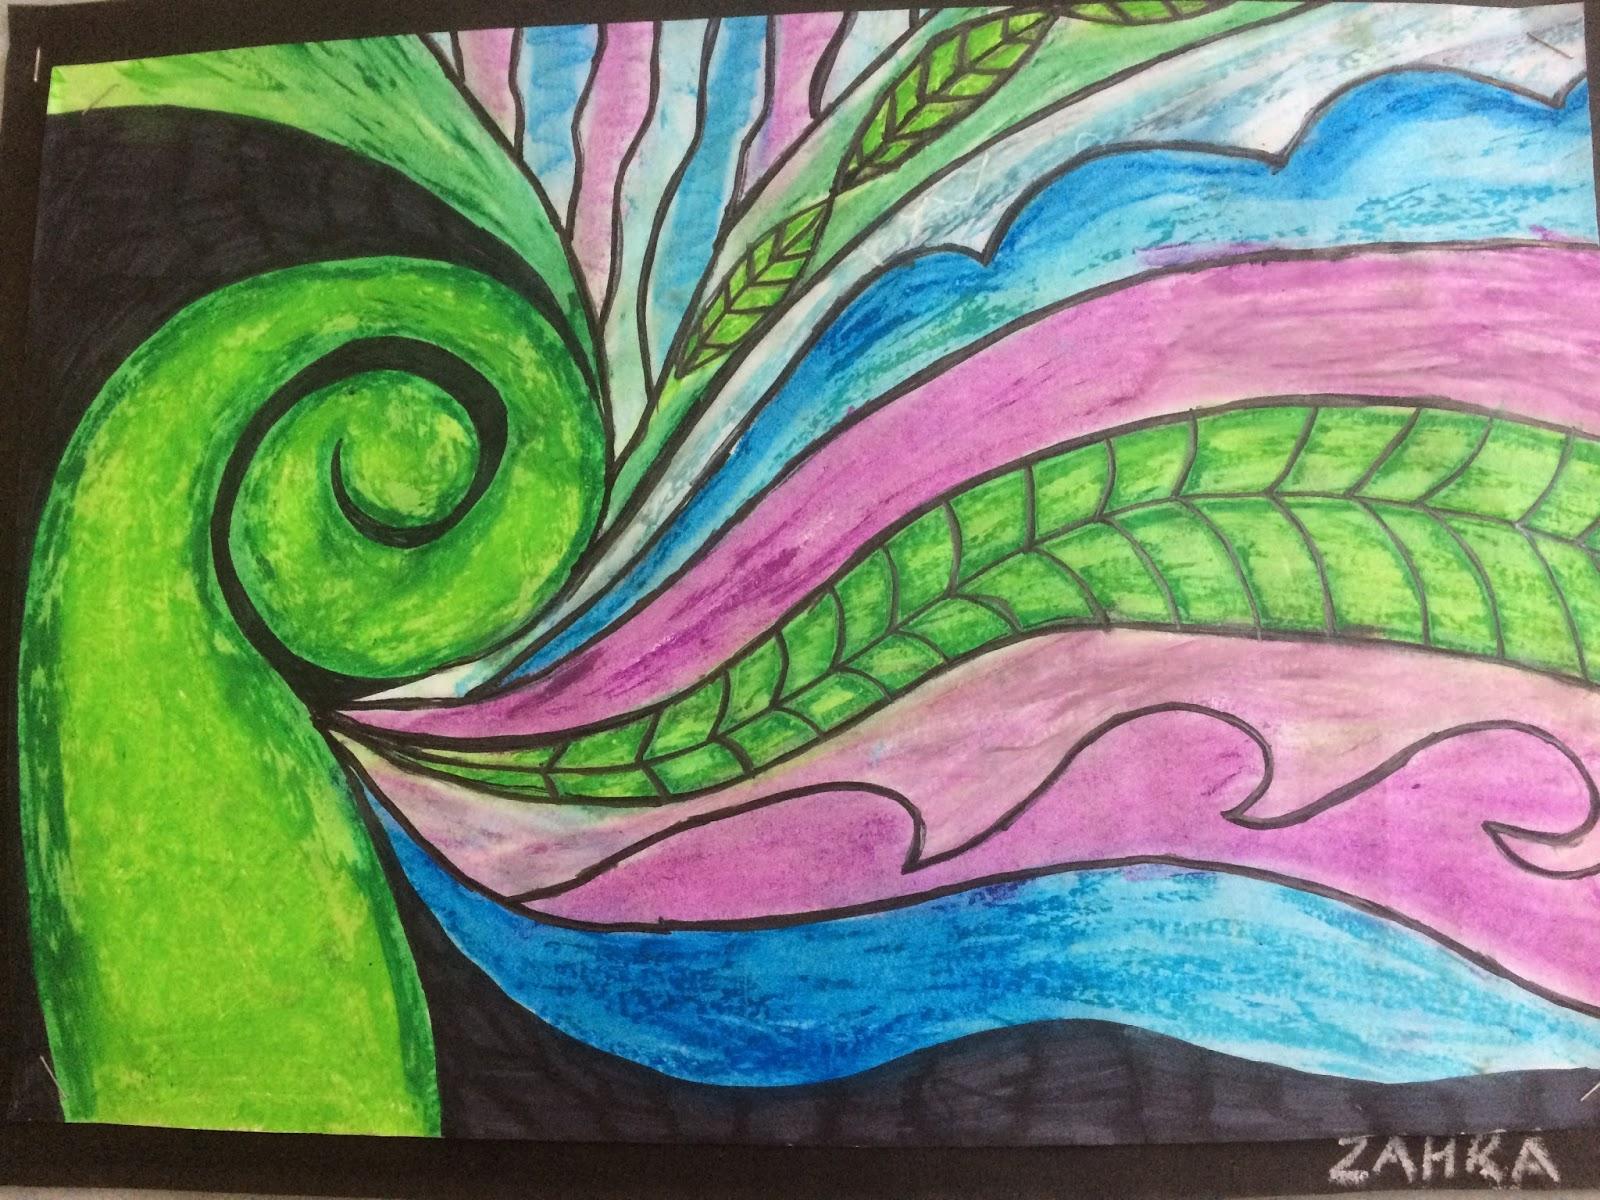 ROOM 16\'S BLOG: Amazing Art!